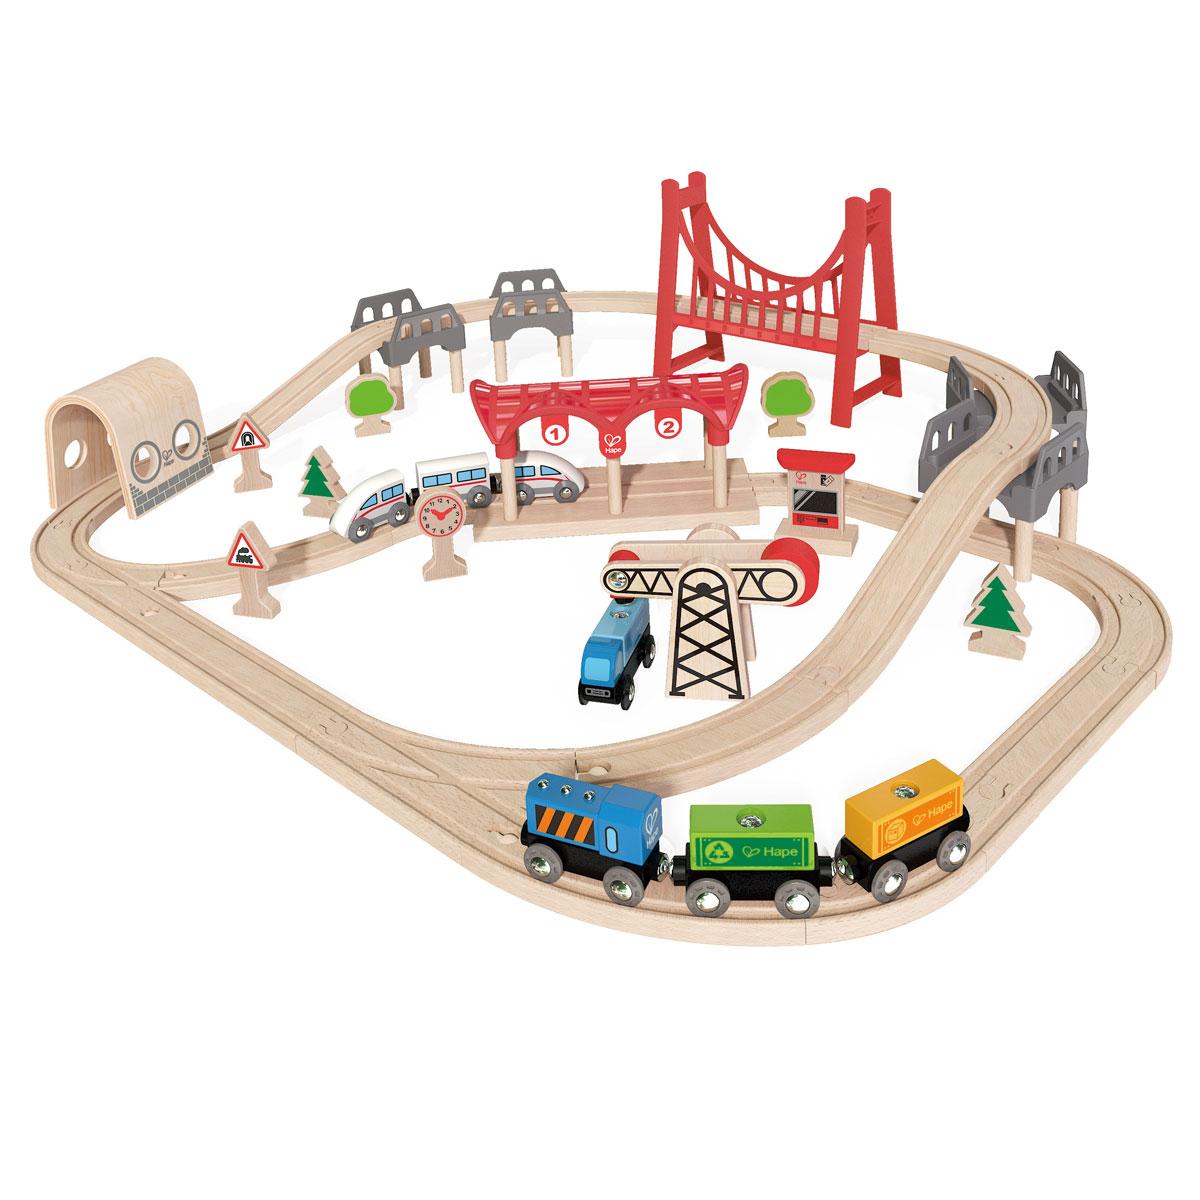 Hape Double Loop Railway Set E3712 Pirum